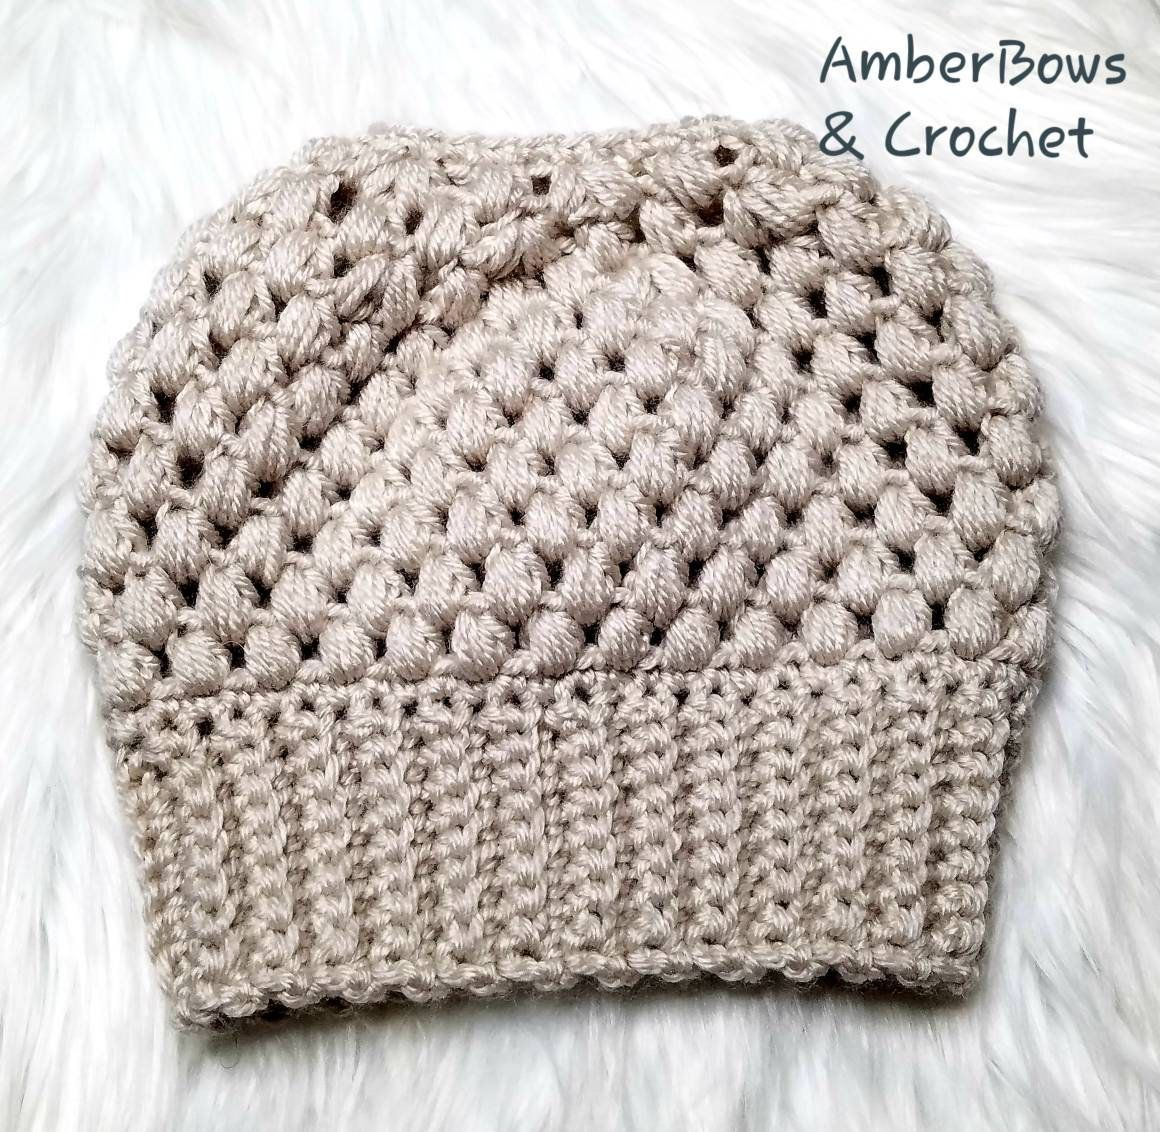 fd0457c4c6718 Youth Crochet Messy Bun Girl s Messy Bun Hat Winter Ponytail Beanie Hat Bun  Hat Viral Bun Beanie by AmberBowsAndCrochet on Etsy